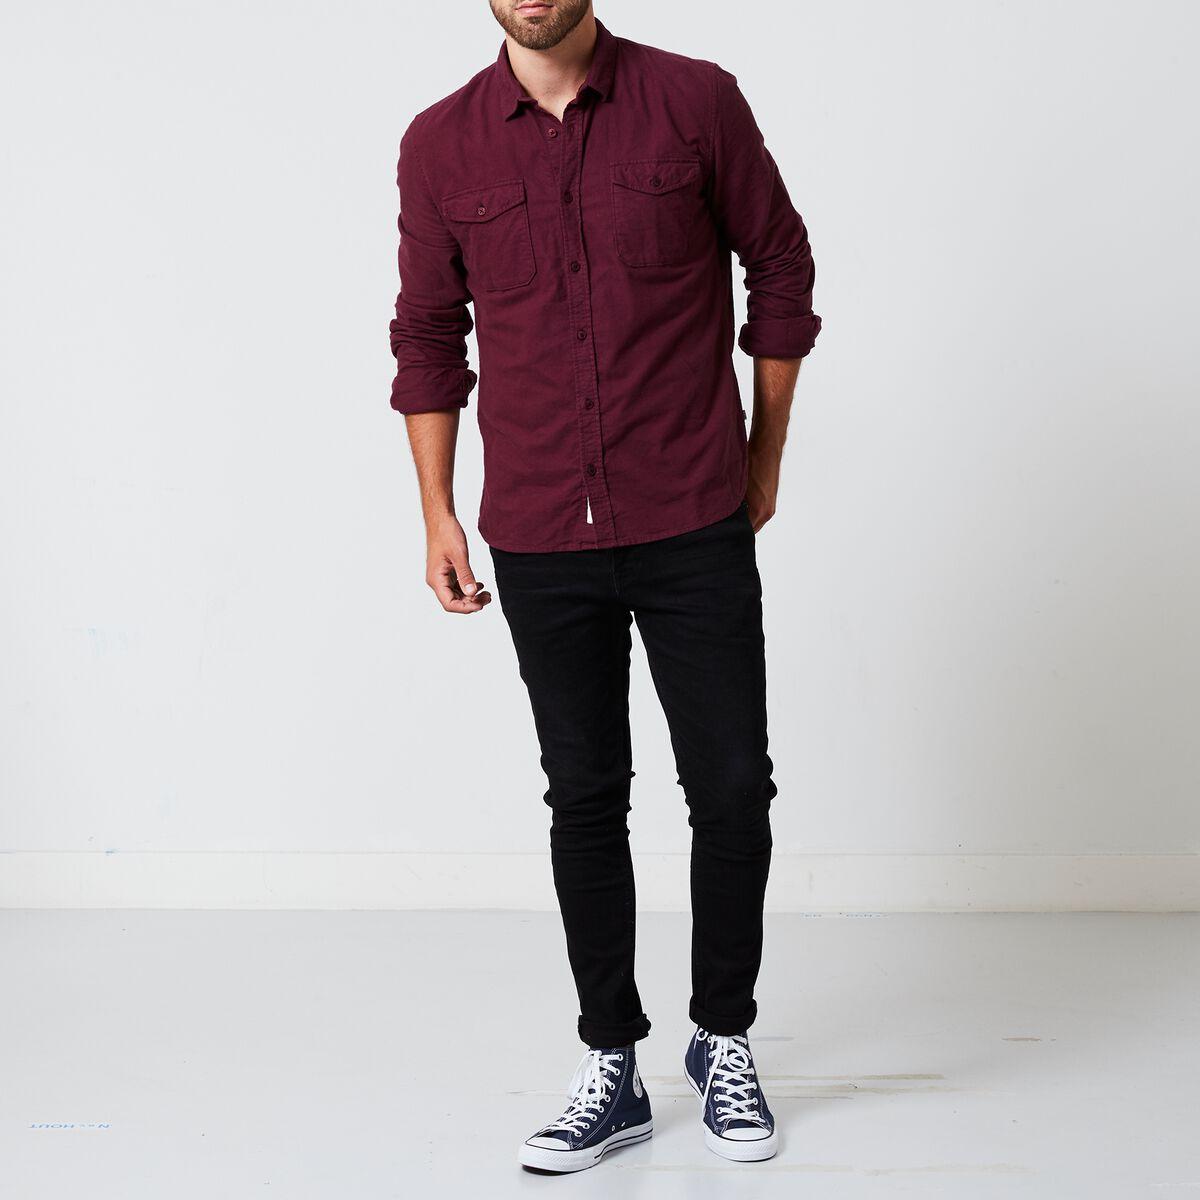 Heren Overhemd Rood.Heren Overhemd Hyder Rood Kopen Online America Today